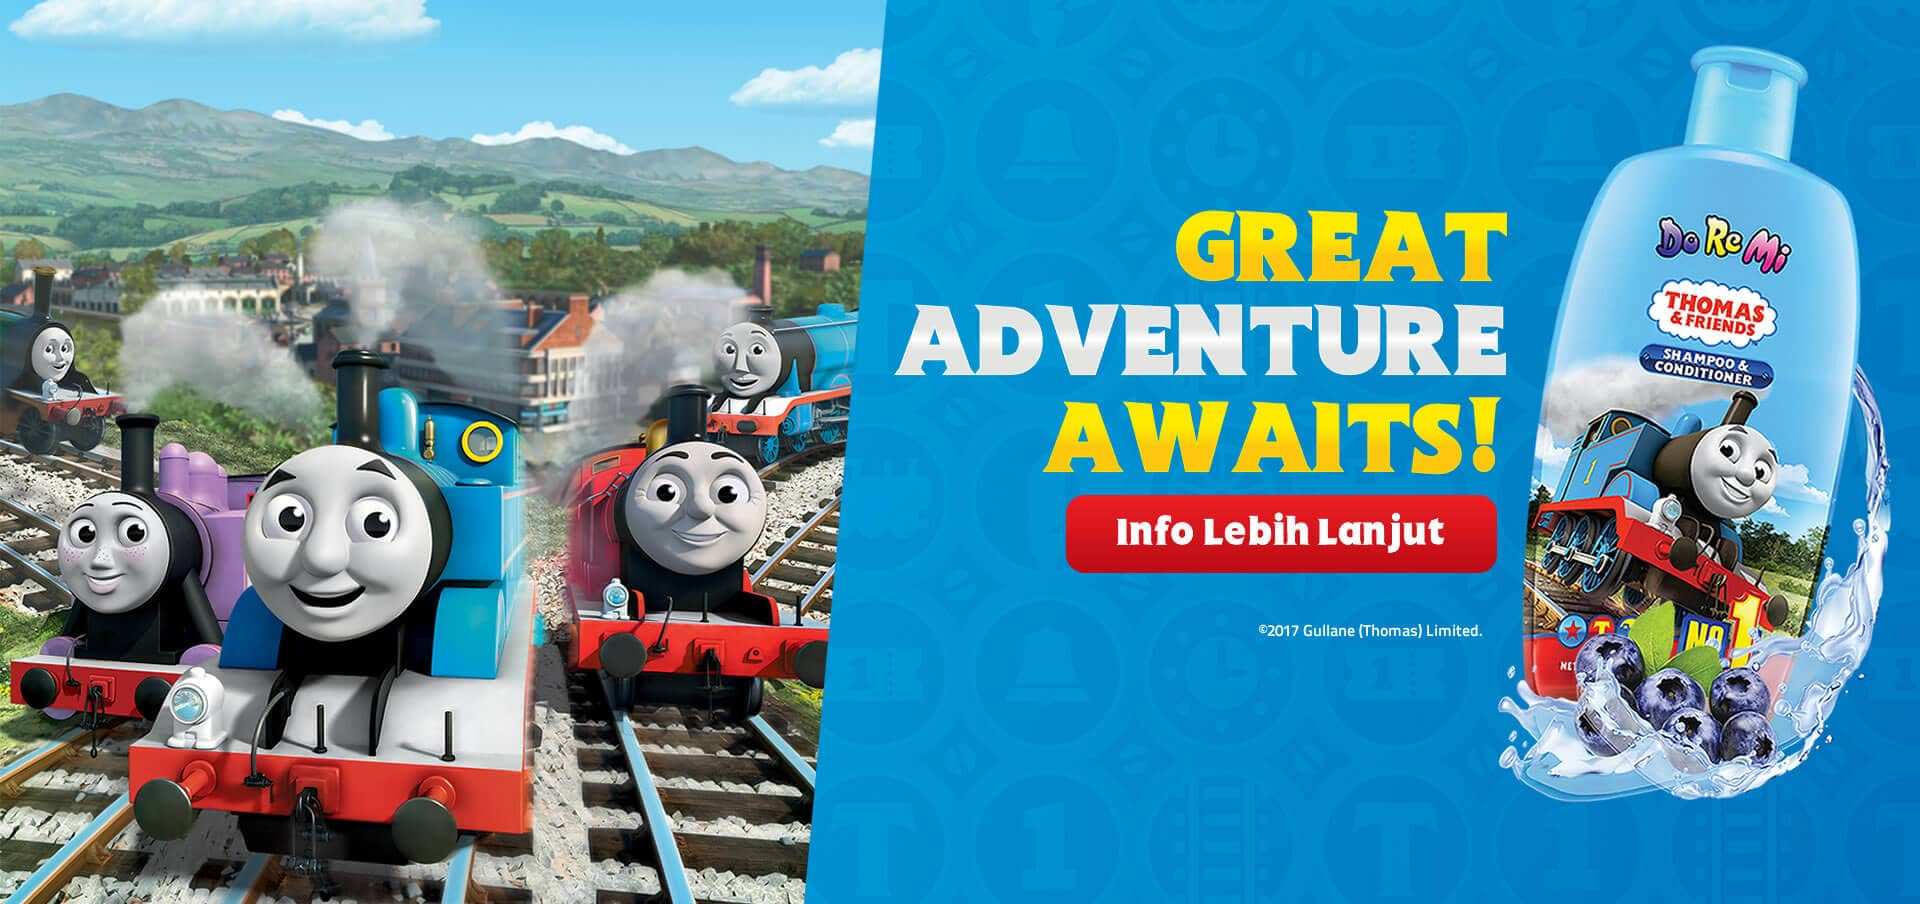 Great Adventure Awaits!